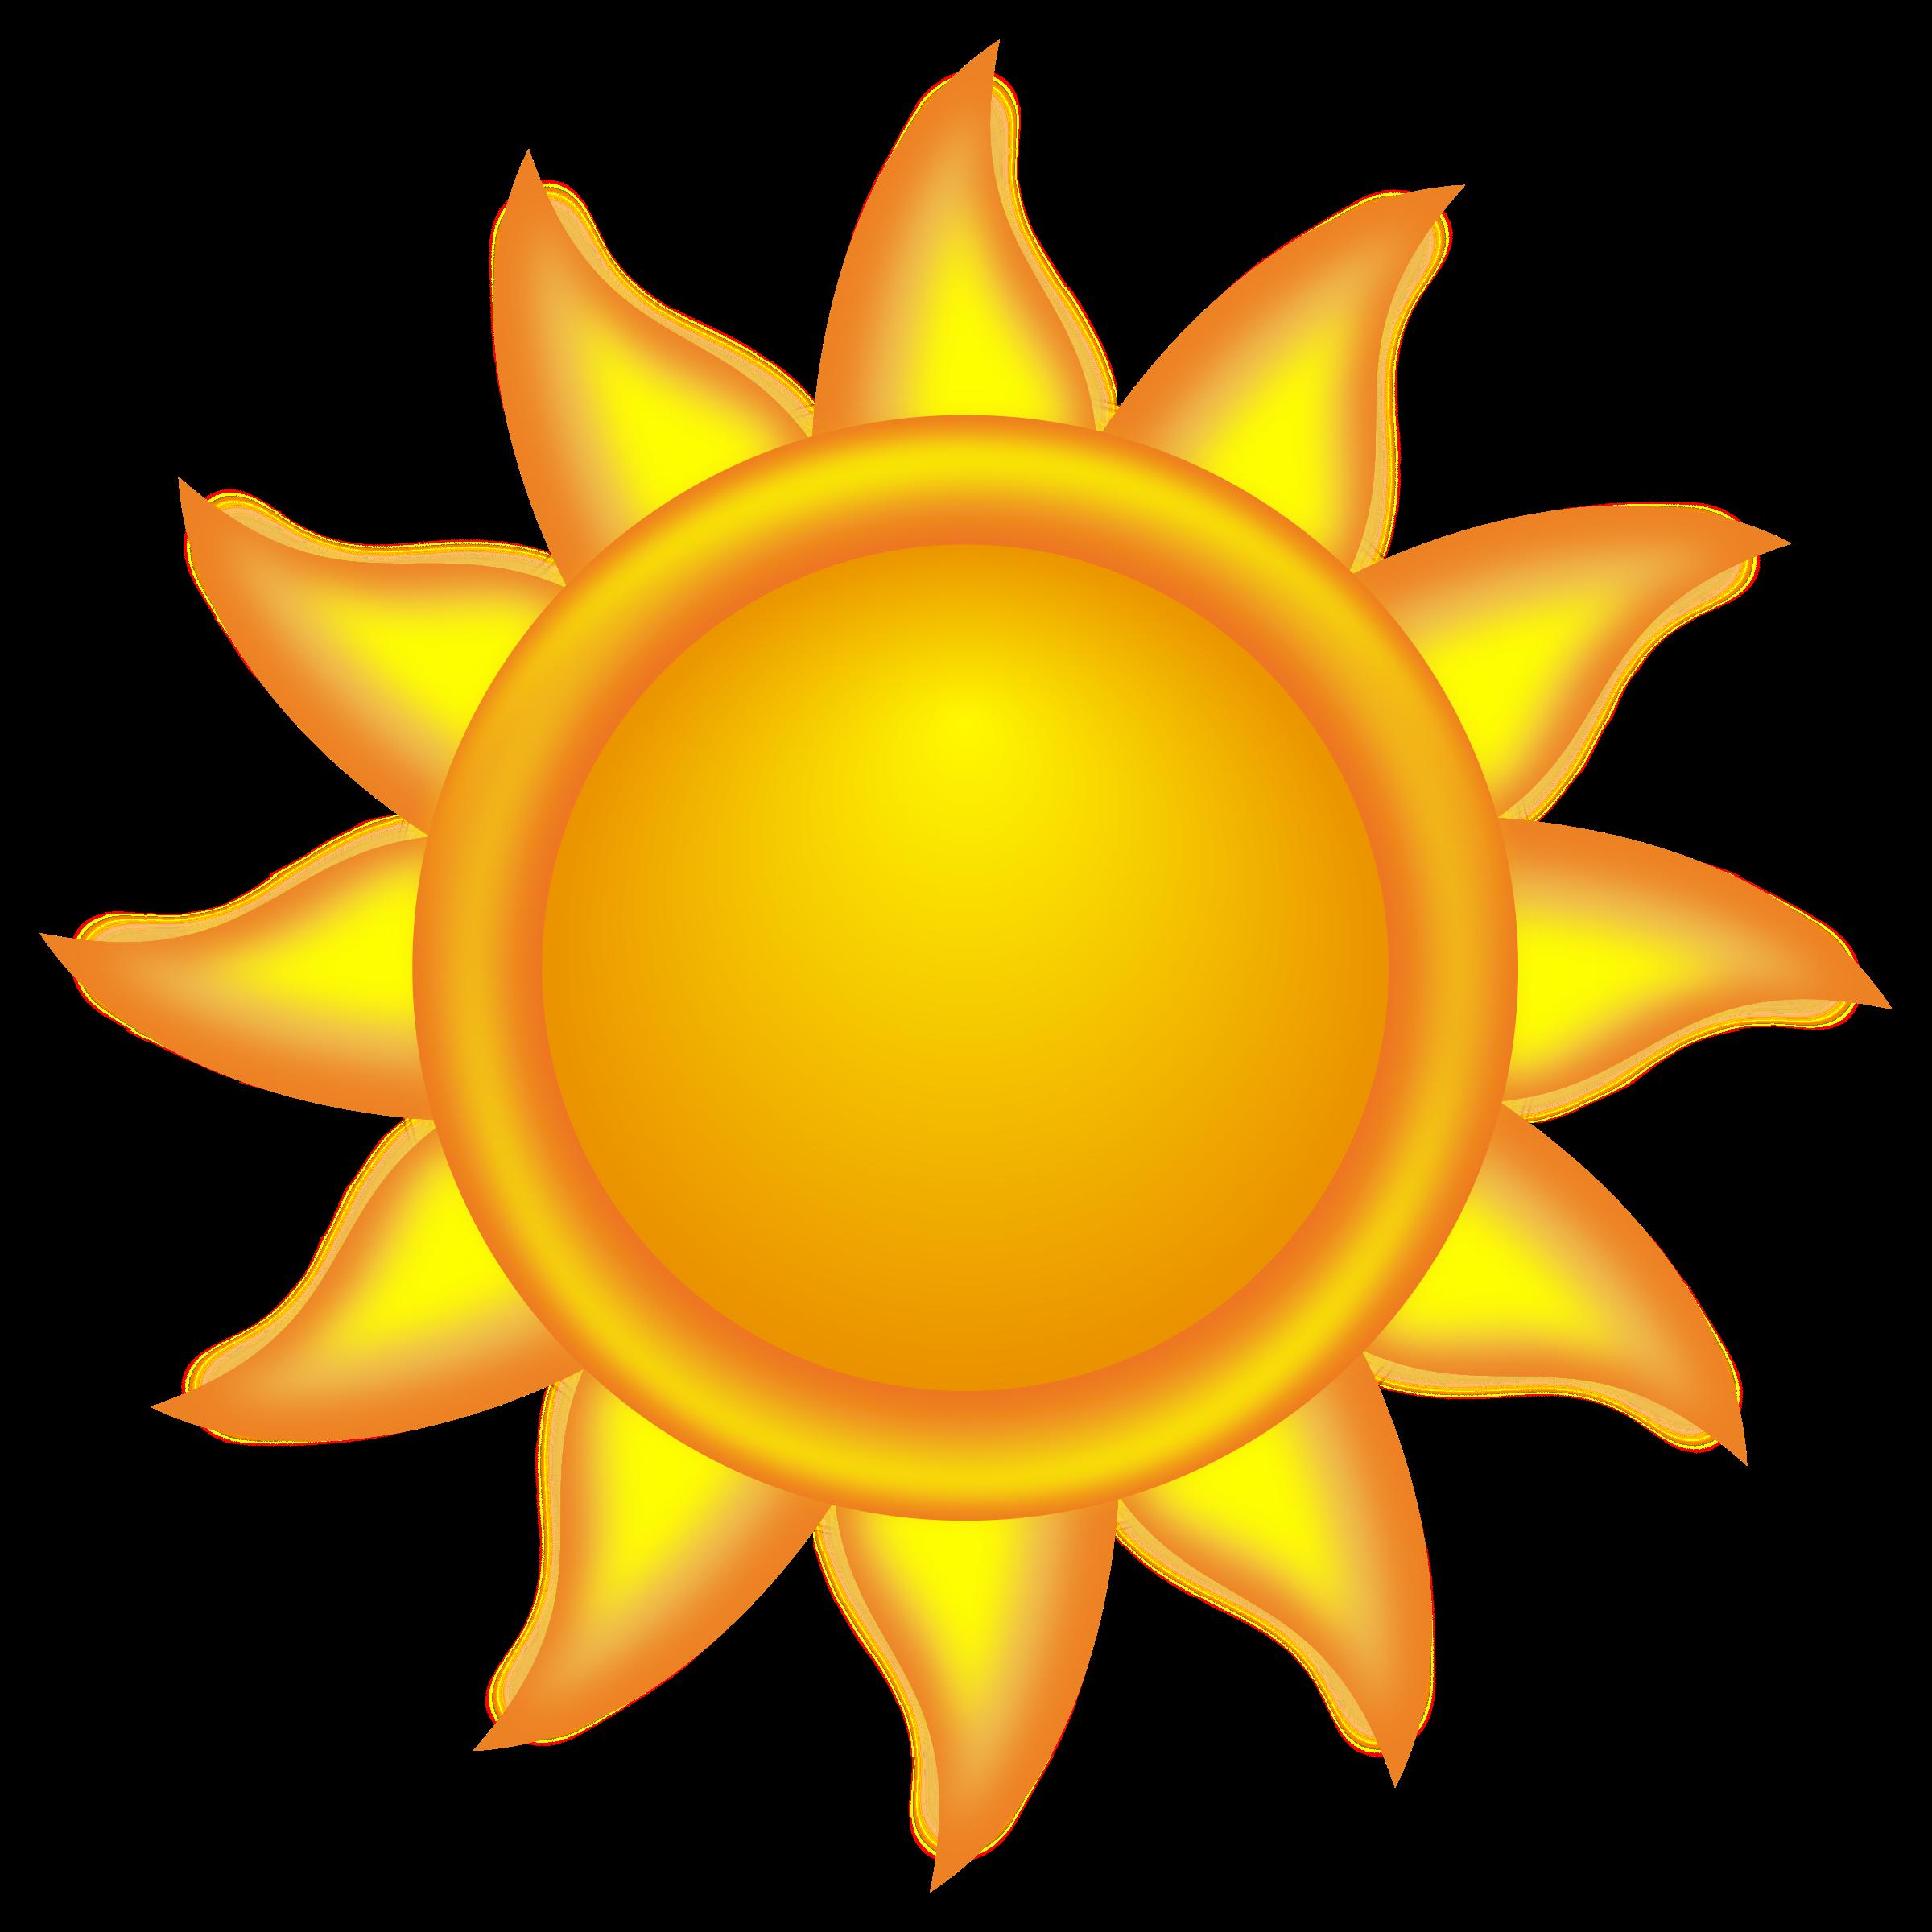 Clipart cube ice melting in the sun jpg freeuse stock Heat Caution & Summer Care – Kyra's Shea Medleys jpg freeuse stock